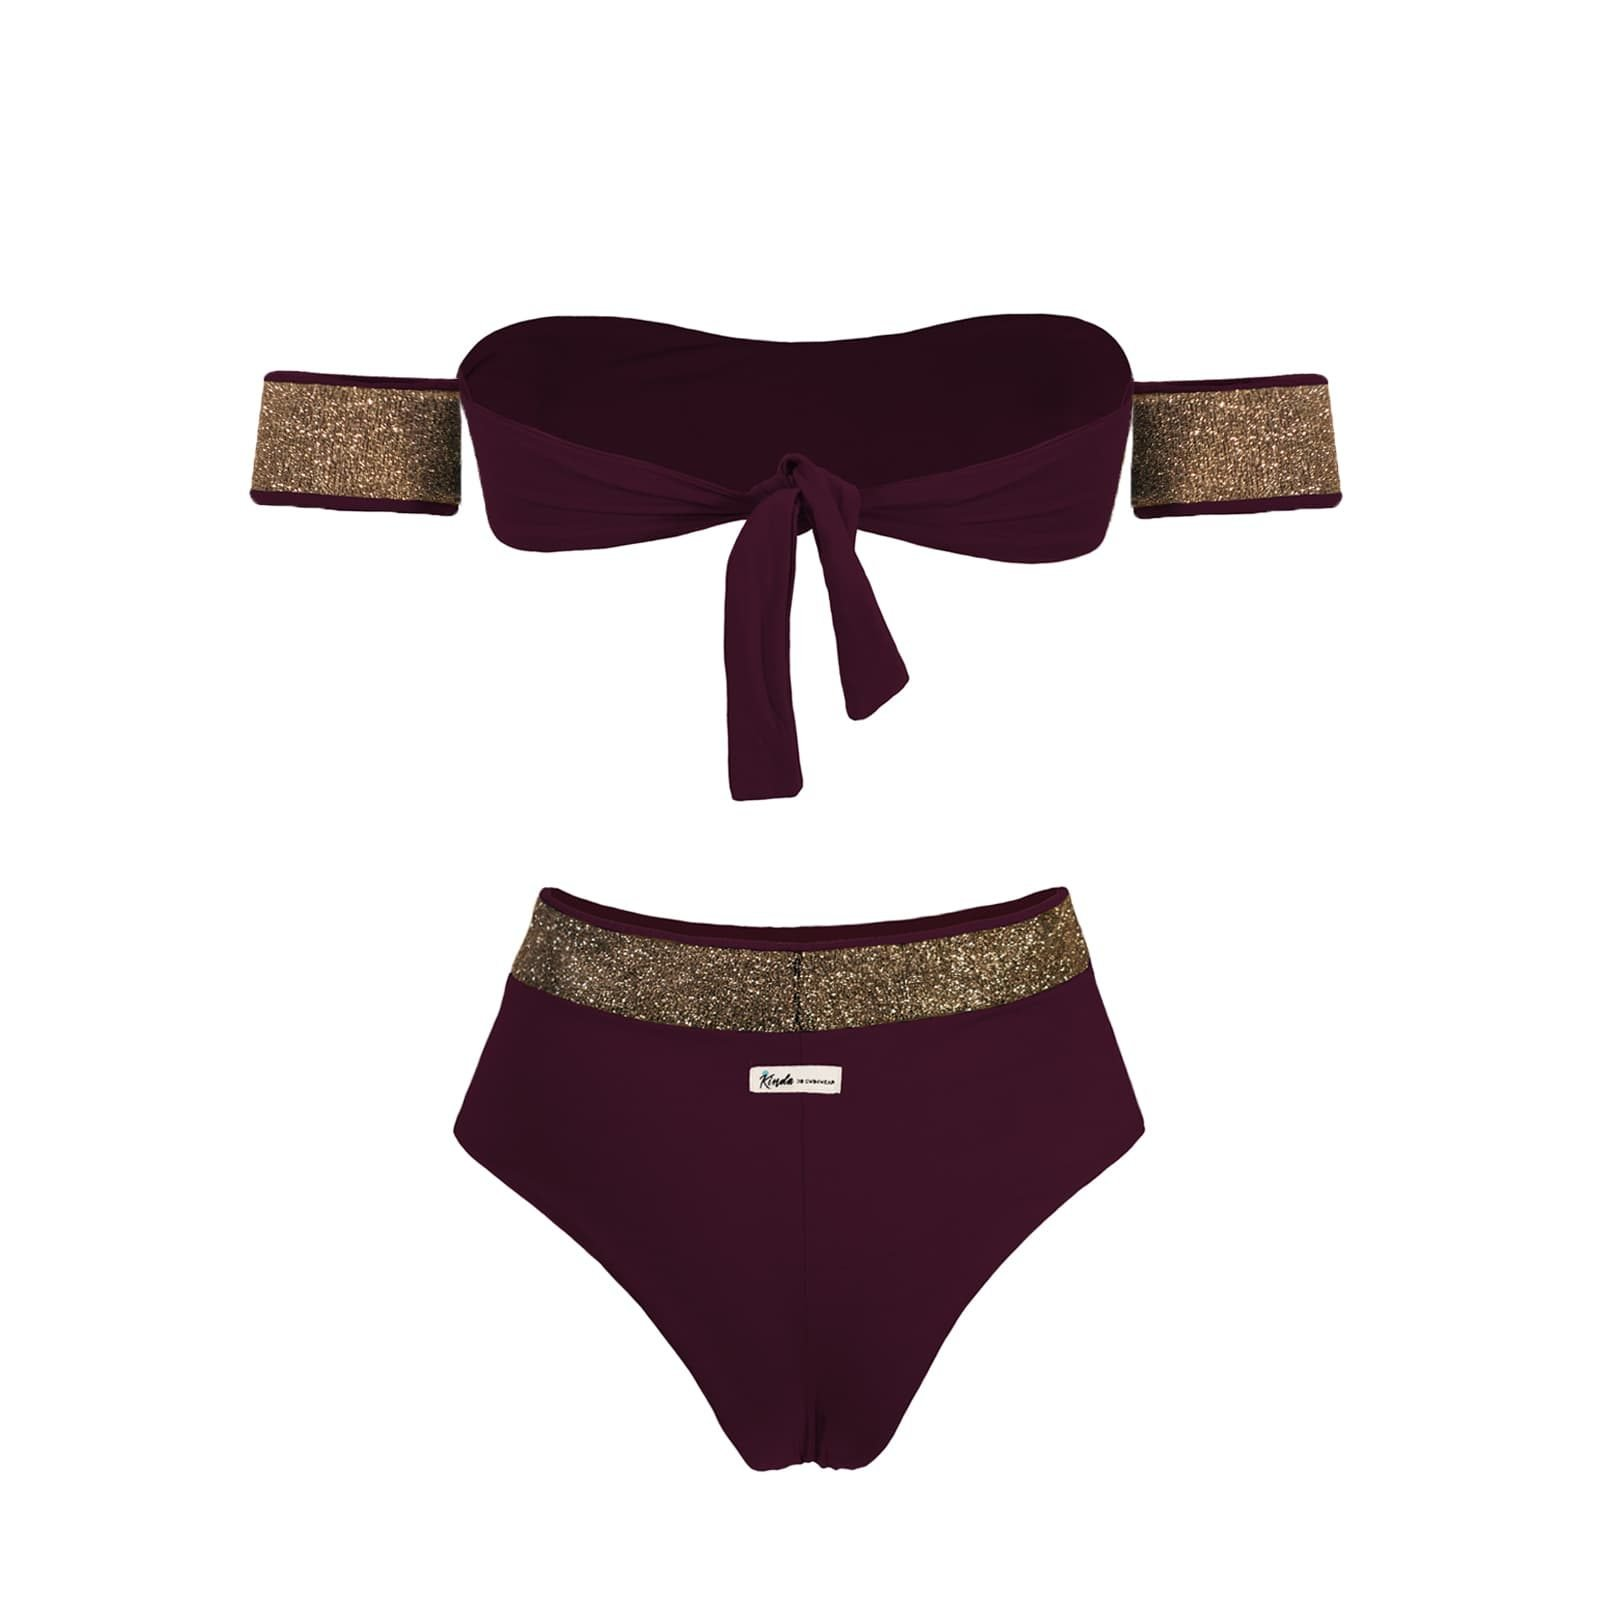 Rockeuse Kinda 3D Swimwear kindaswimwear bikini bordeaux plum swimsuit onepiece twopiece golden bikini oro color melanzana body calzedonia natale capodanno xmas limited edition edizione limita (1)